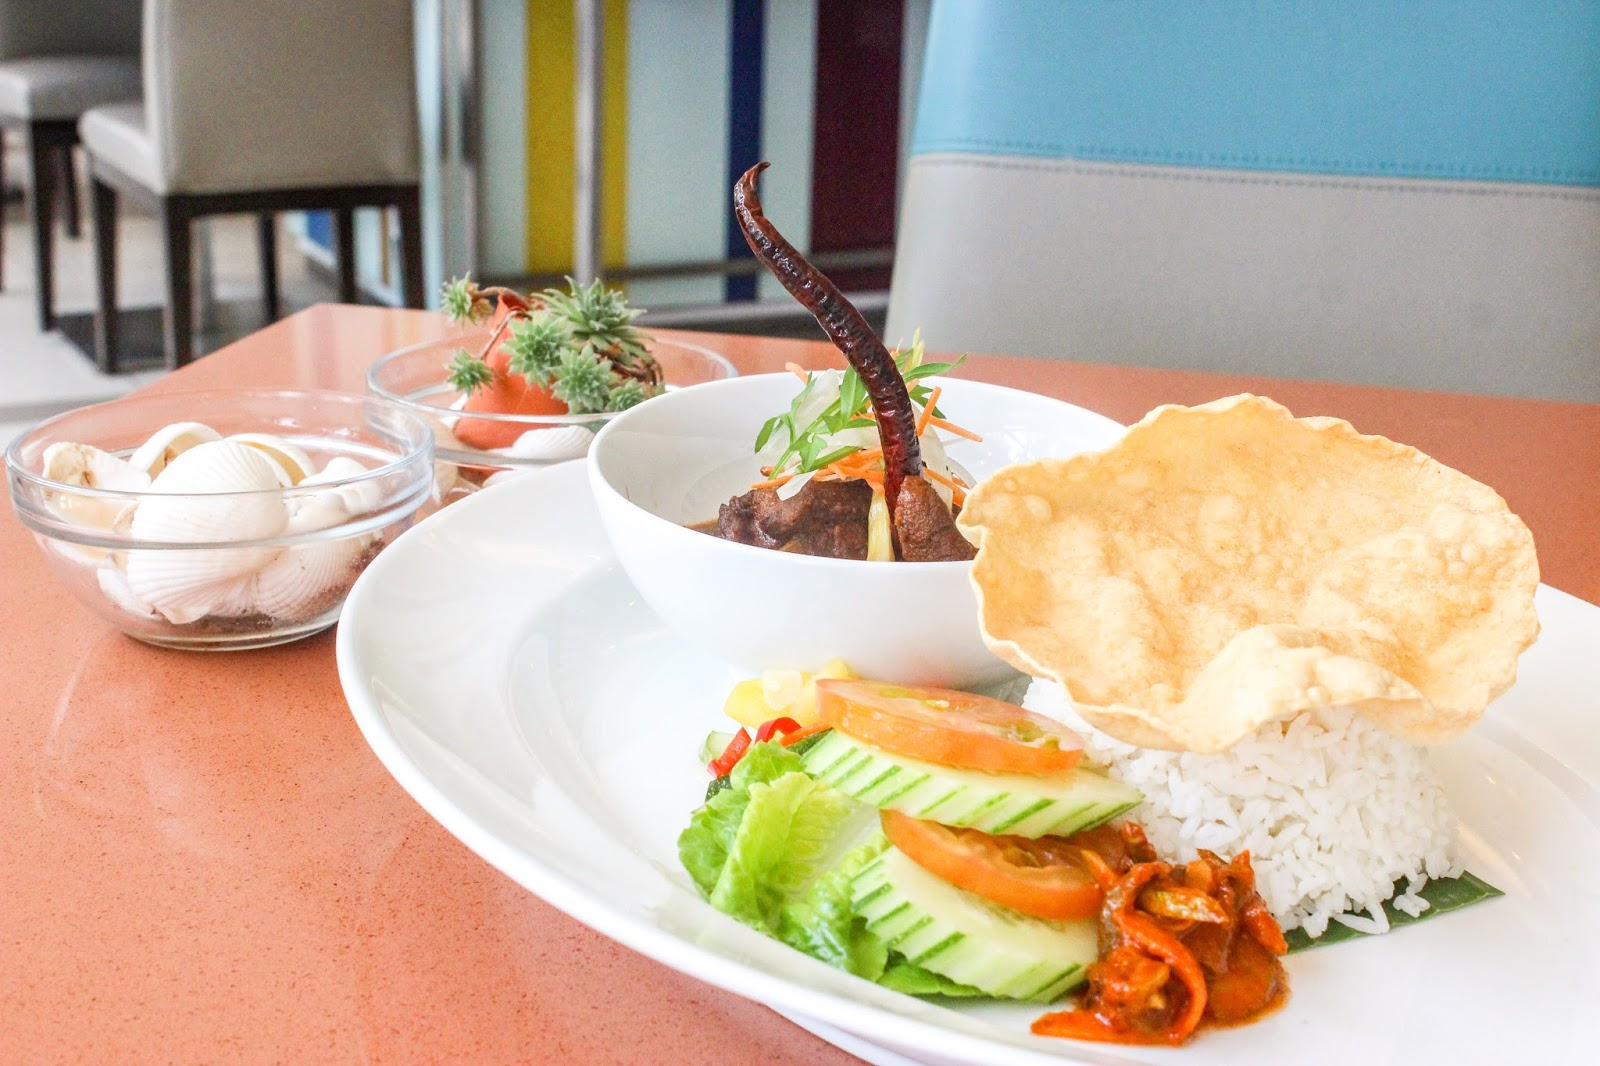 New Ala Carte Menu @ The Eatery, Four Points by Sheraton, Tanjung Bungah, Penang